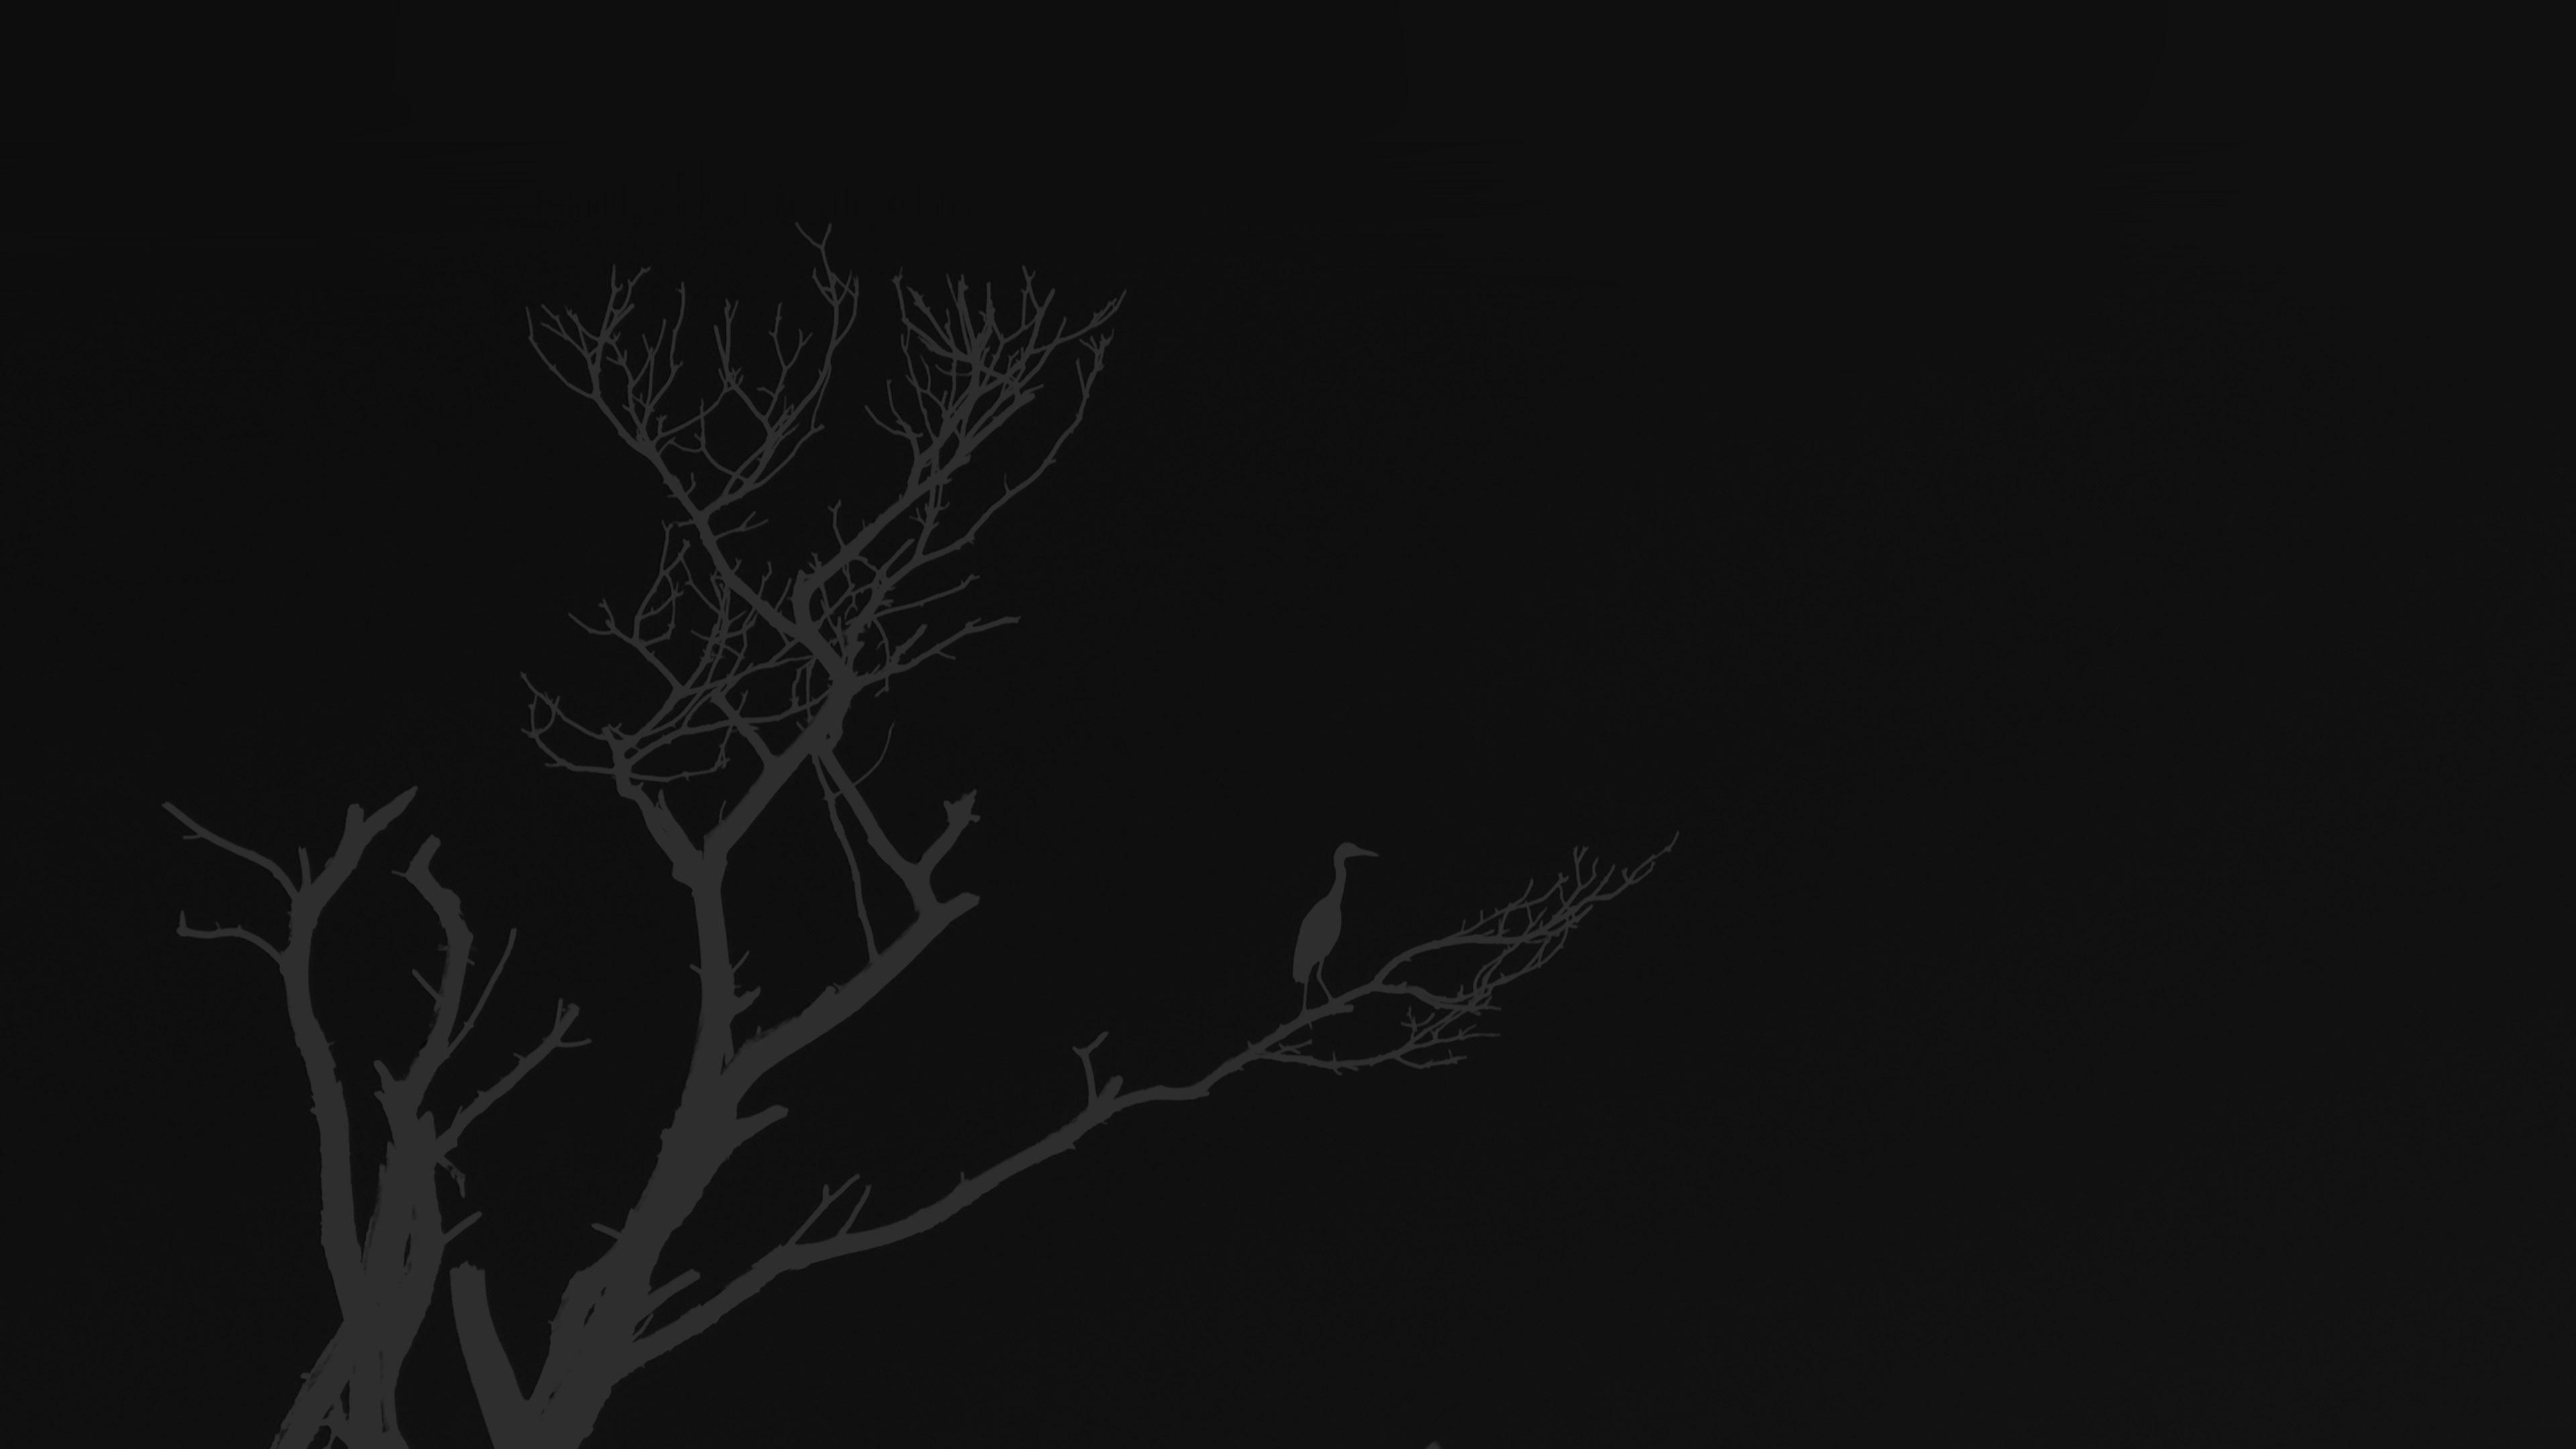 Iphone  Wallpaper Wallpaper For Desktop Laptop Mk98 Bird Sunset Tree Dark